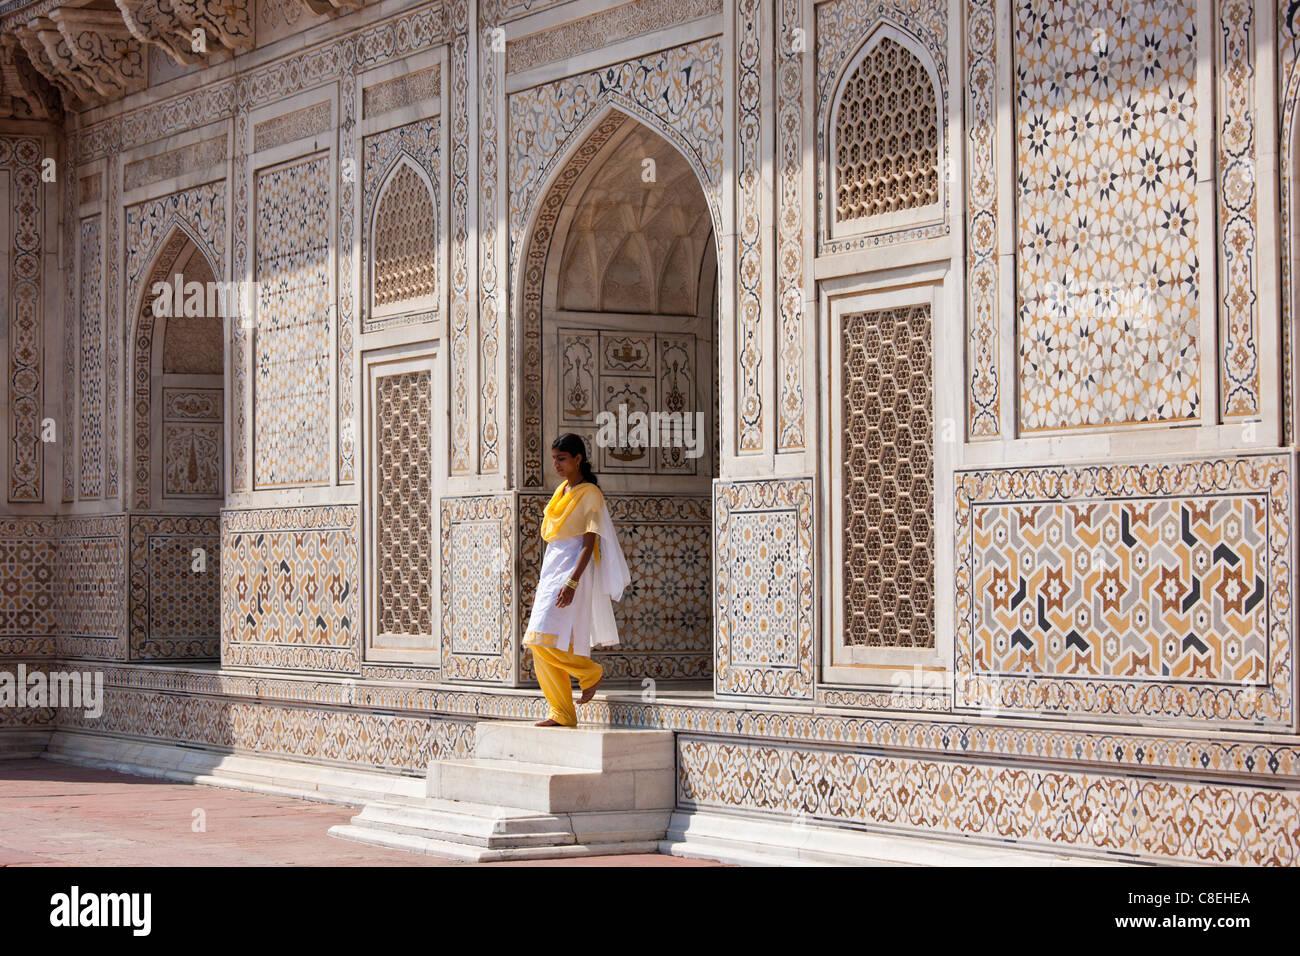 Punjabi chica musulmana en la tumba de Etimad Ud Doulah tumba mogol del siglo XVII, construido 1628, Agra, India Imagen De Stock